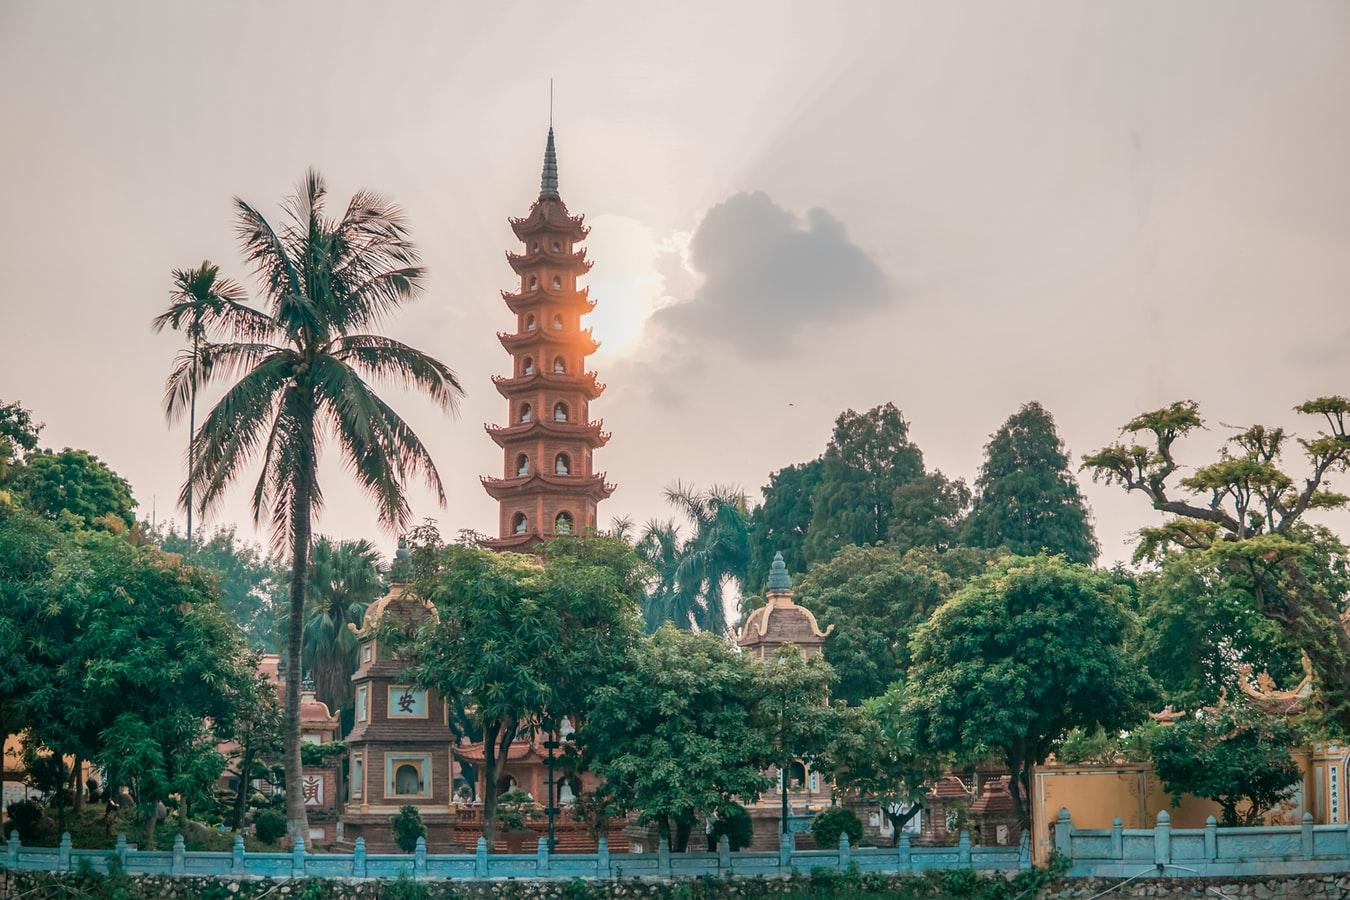 Blick auf die Tran Quoc-Pagode in Hanoi Vietnam